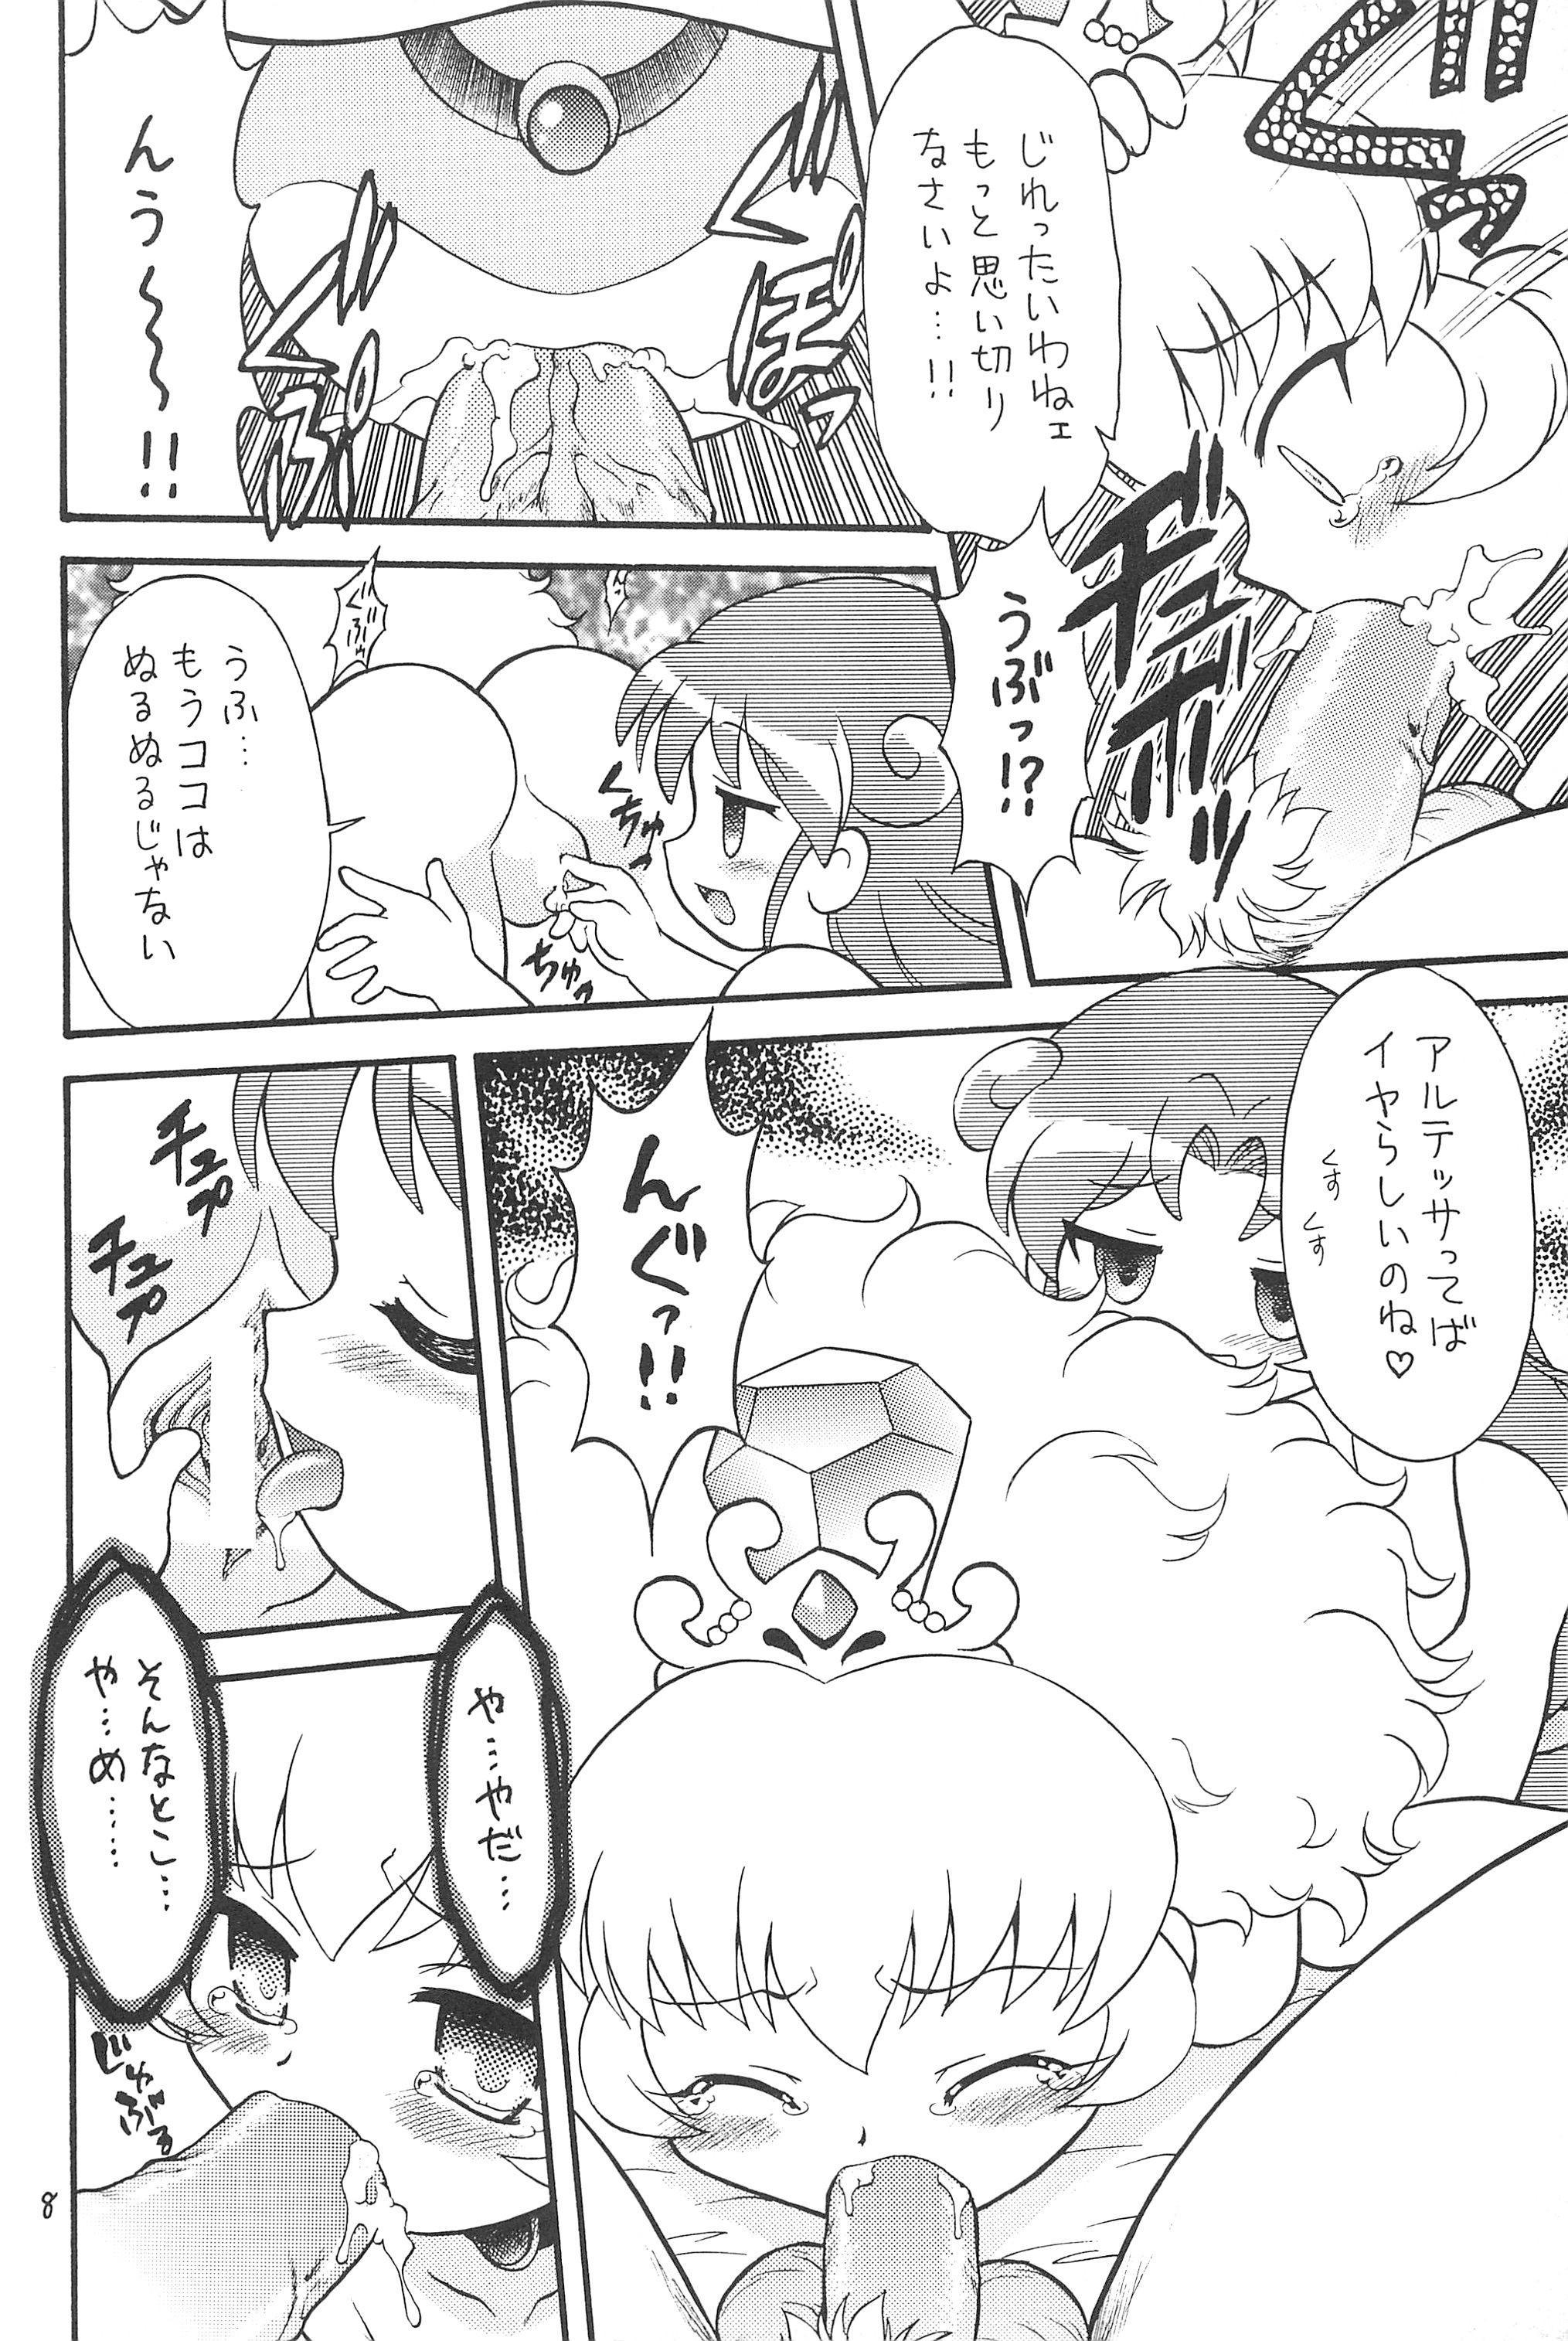 Higawari Obentou 7